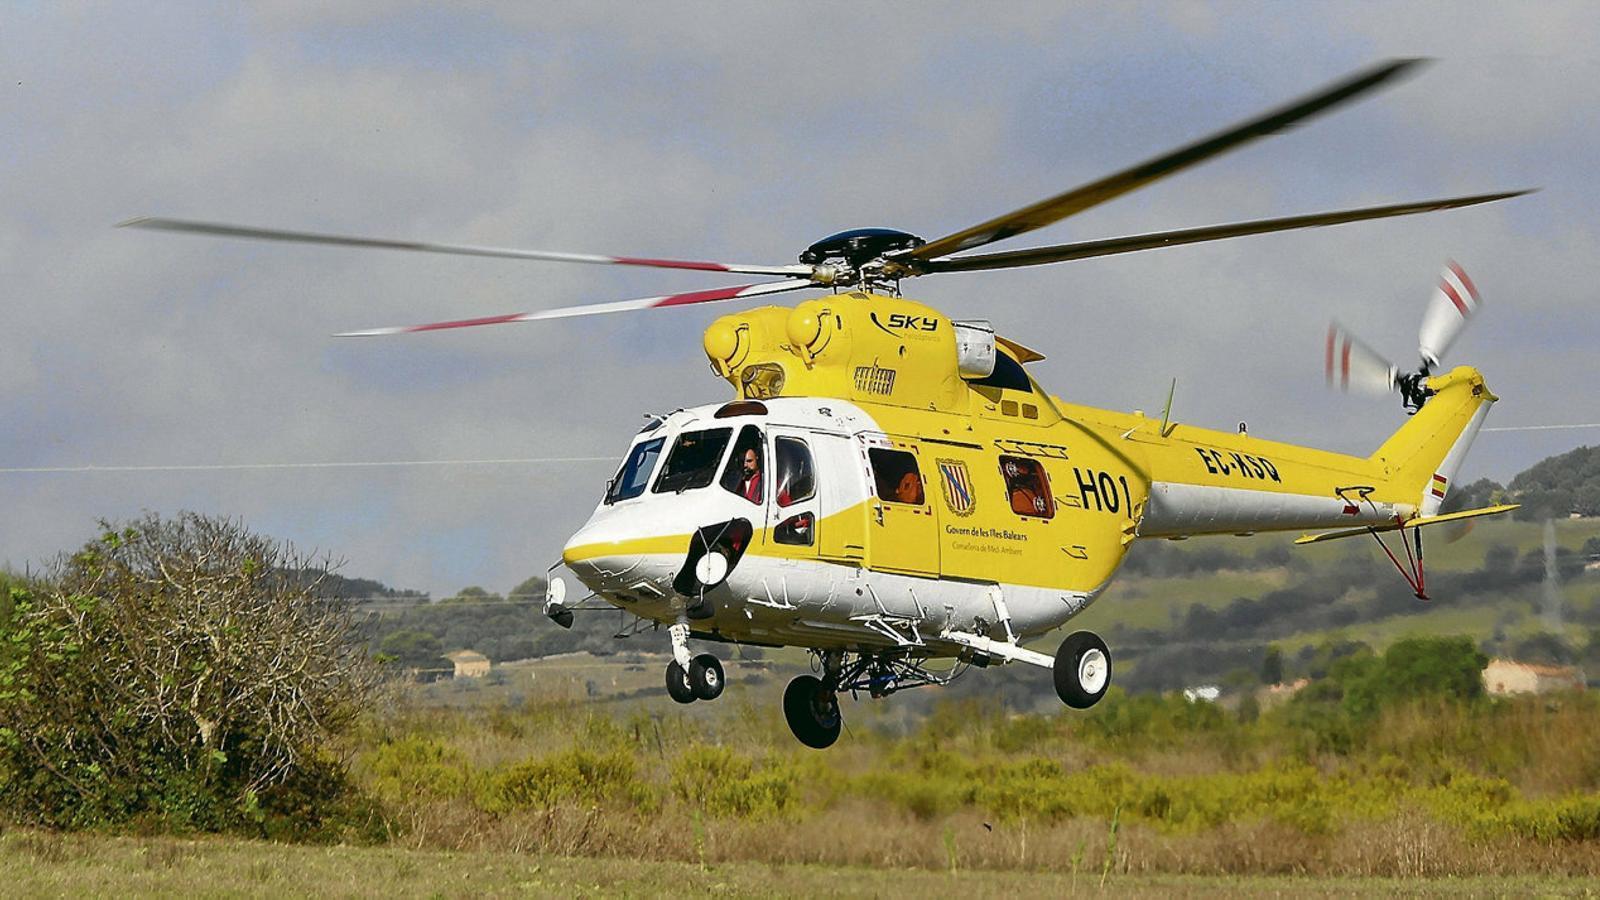 Prop de quinze aeròdroms i heliports donen servei a unes  40 aeronaus A les Illes